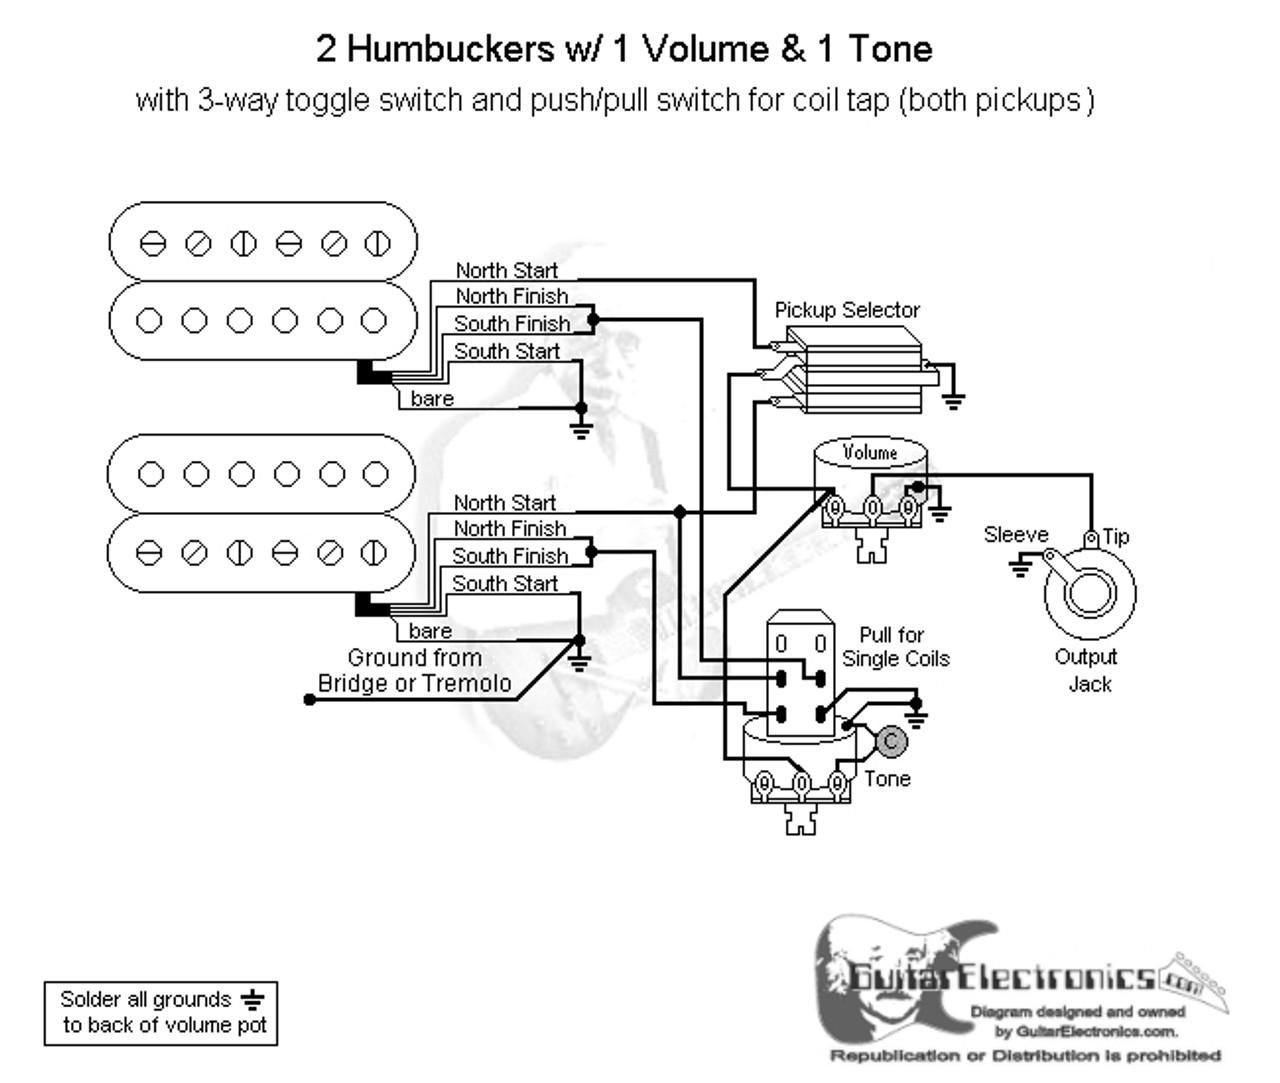 medium resolution of wiring diagrams single humbucker guitar pick up tone volume and2 humbuckers 3 way toggle switch 1